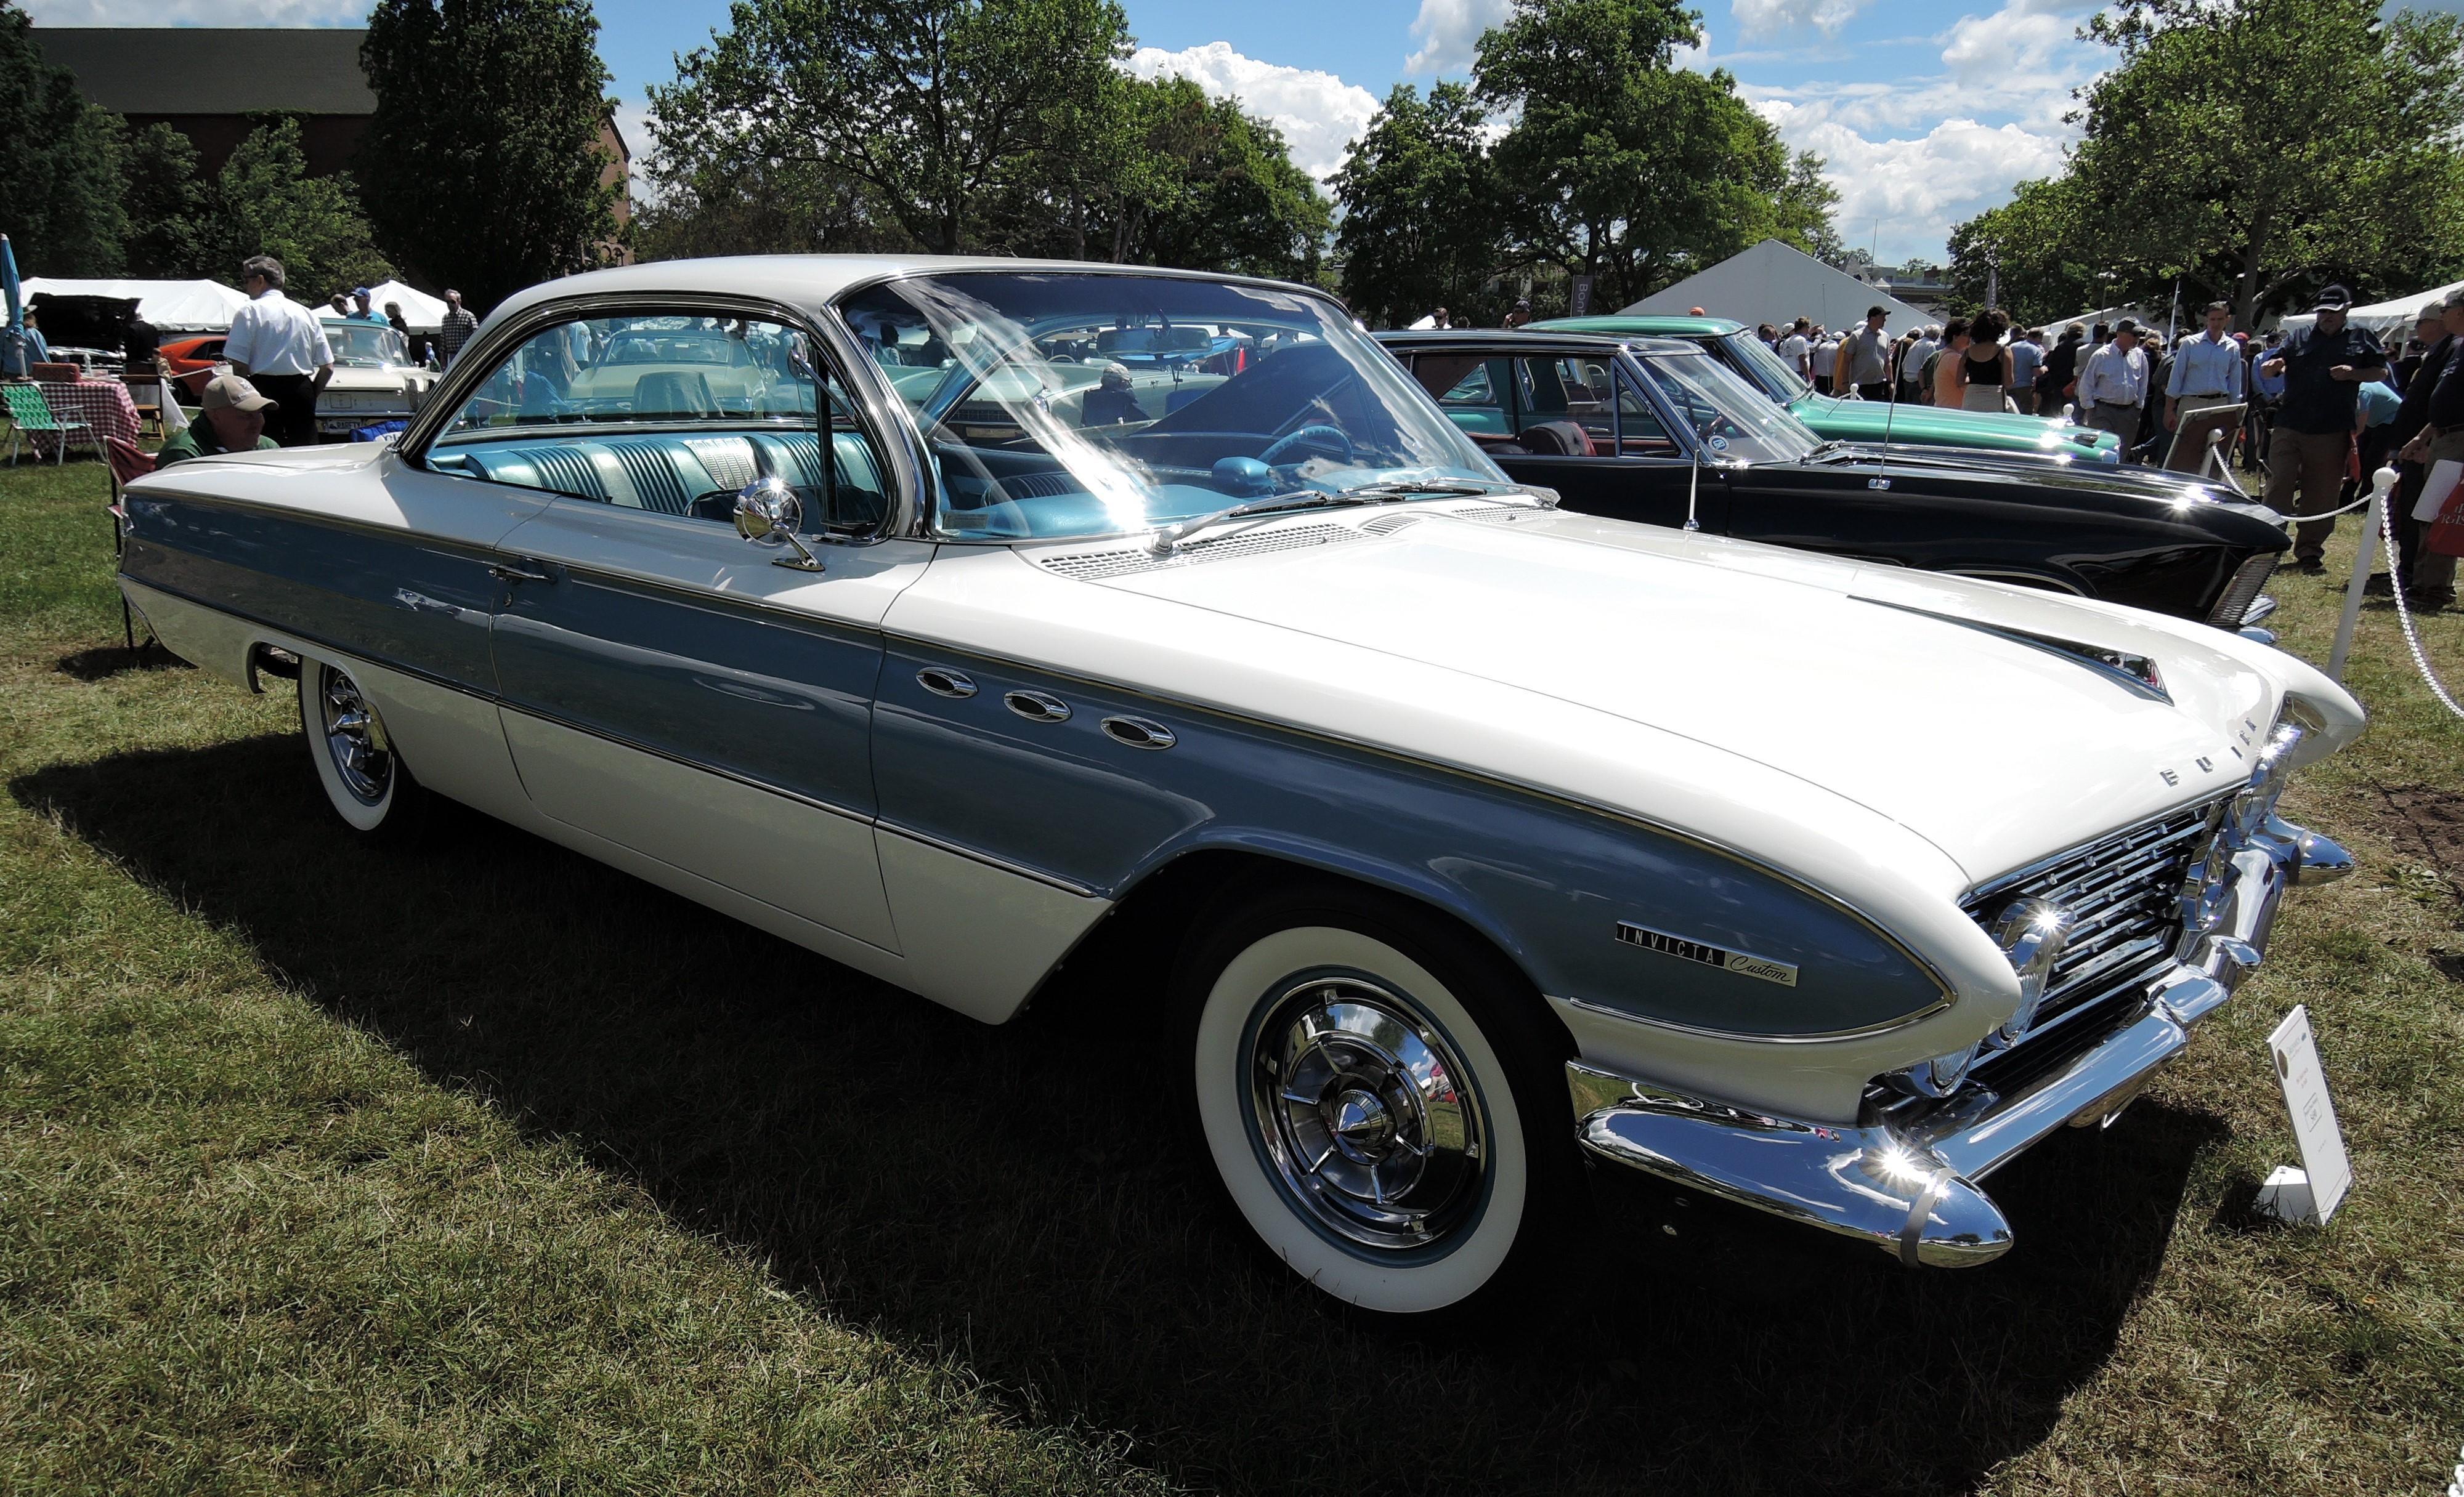 white/blue 1961 Buick Invicta - Greenwich Concours d'Elegance 2017